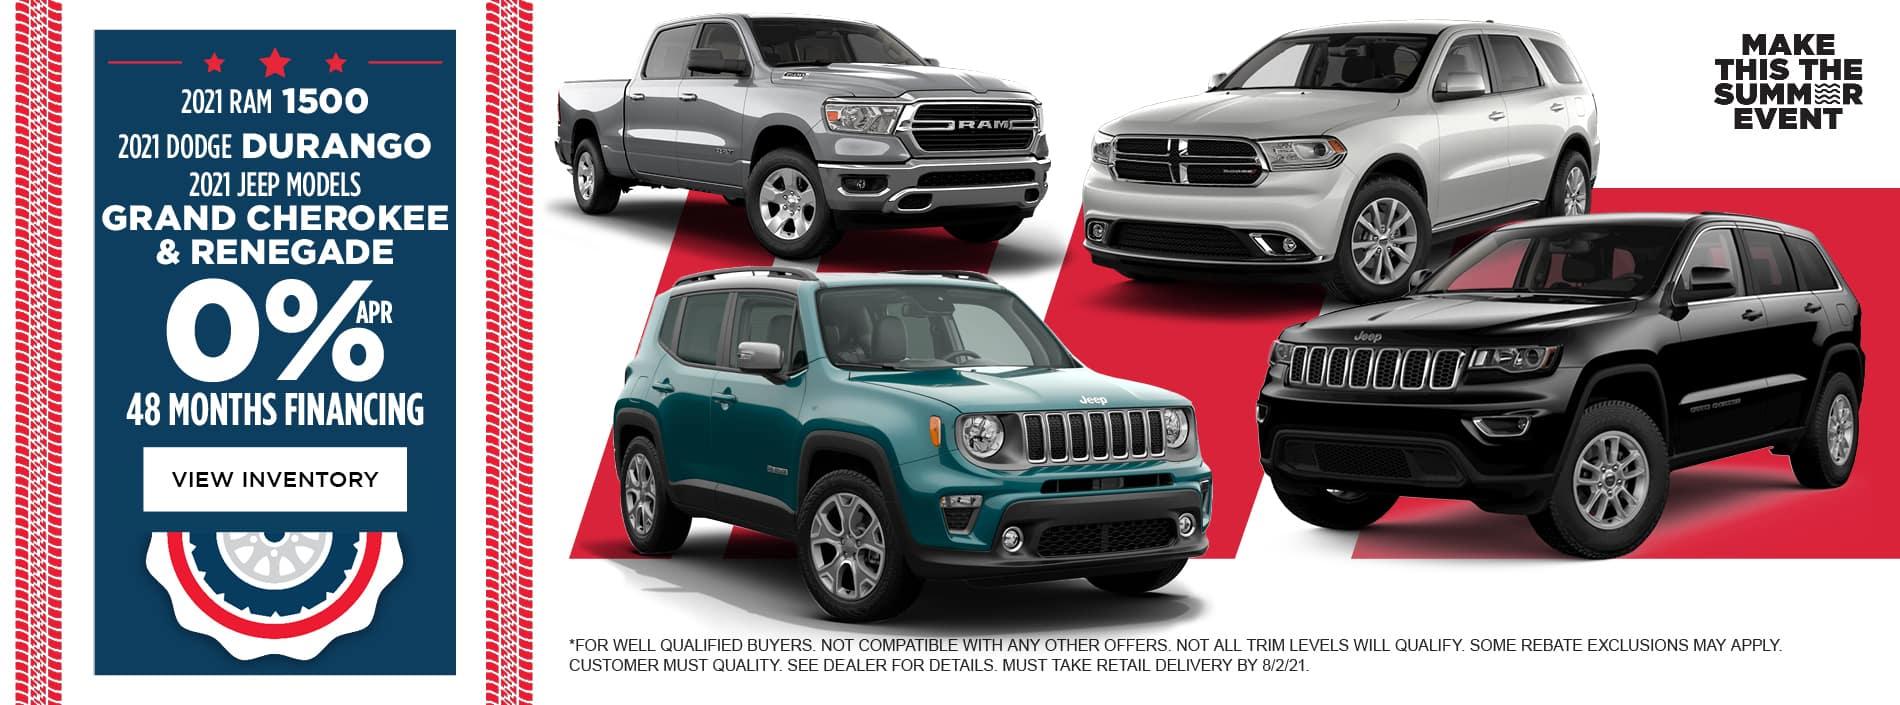 0% APR for 48 Months 2021 Dodge Durango 2021 Jeep Grand Cherokee 2021 Jeep Renegade 2021 RAM 1500